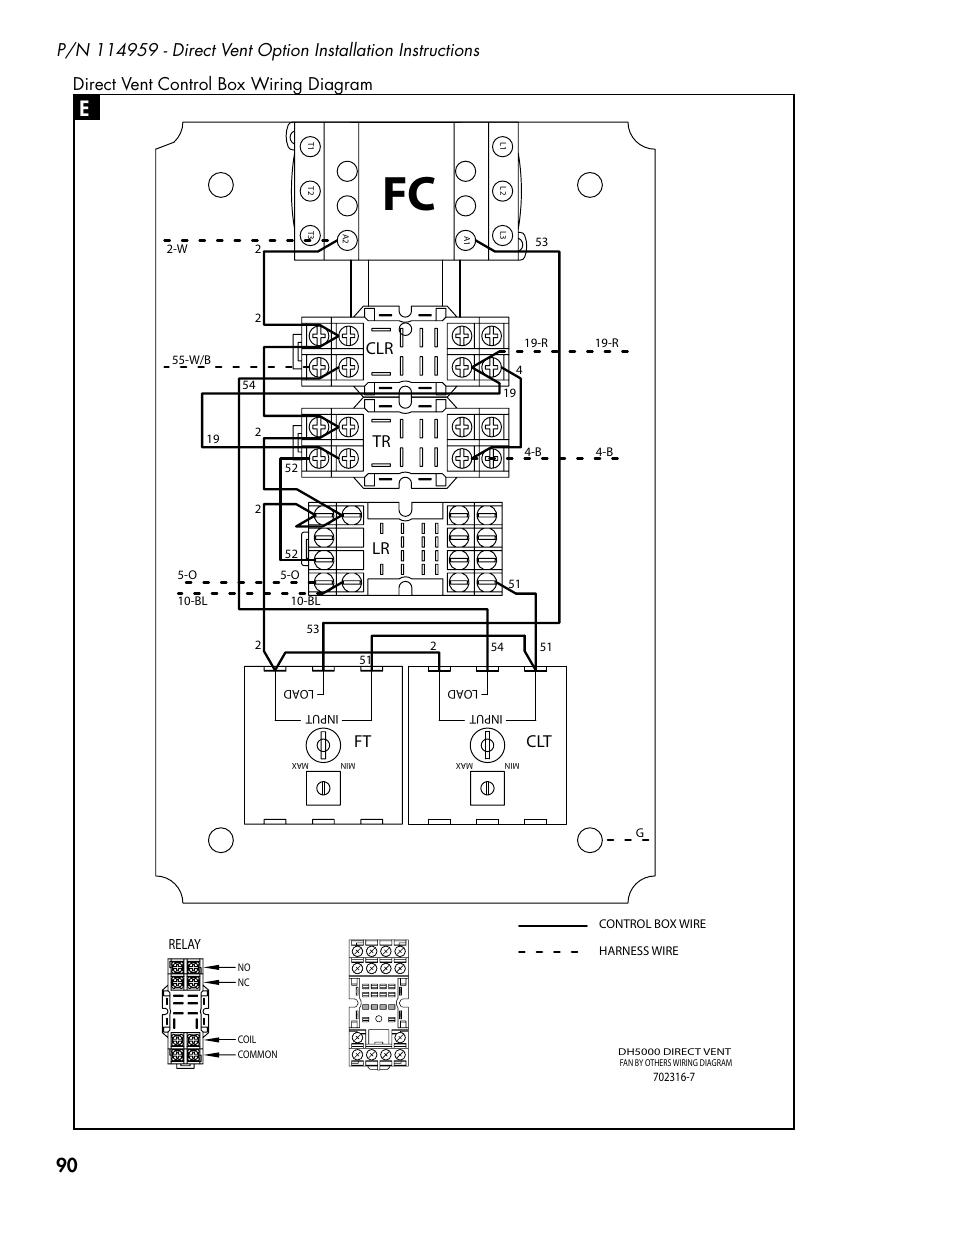 Latch Relay Base  Ft Clt Lr Tr  Direct Vent Control Box